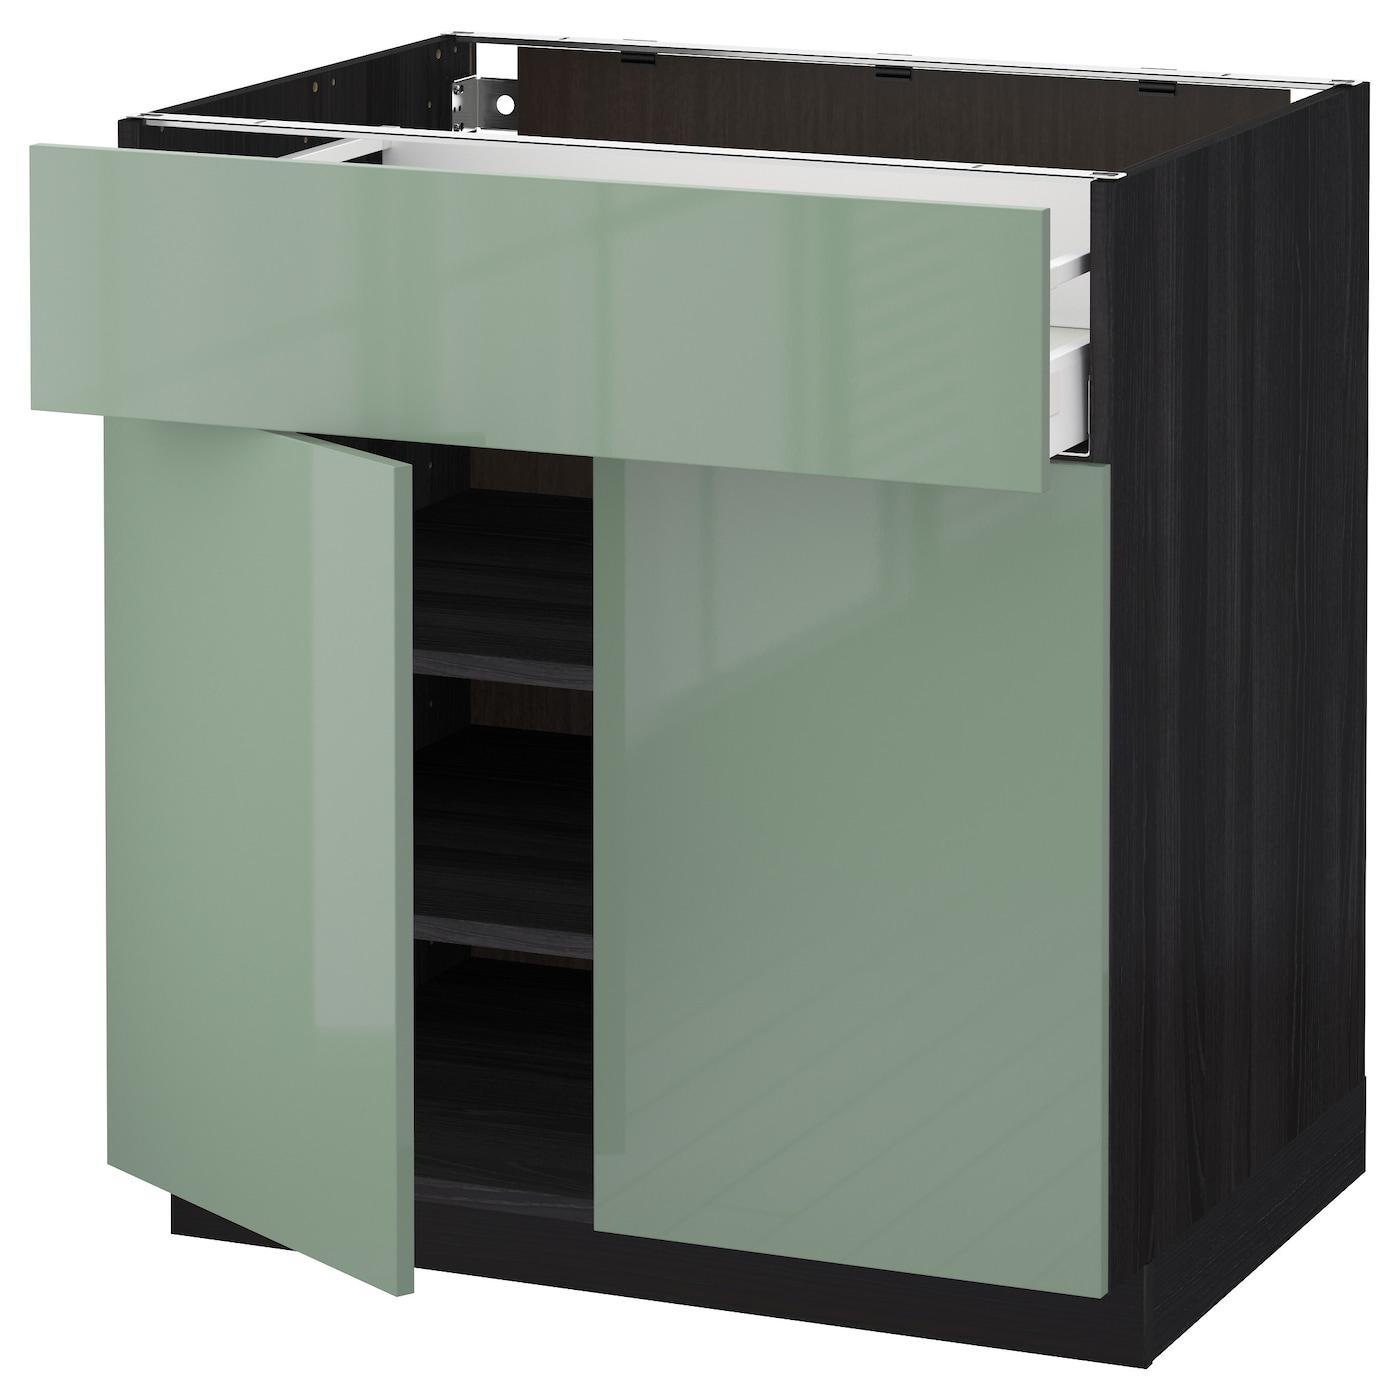 METOD/MAXIMERA Base Cabinet With Drawer/2 Doors Black